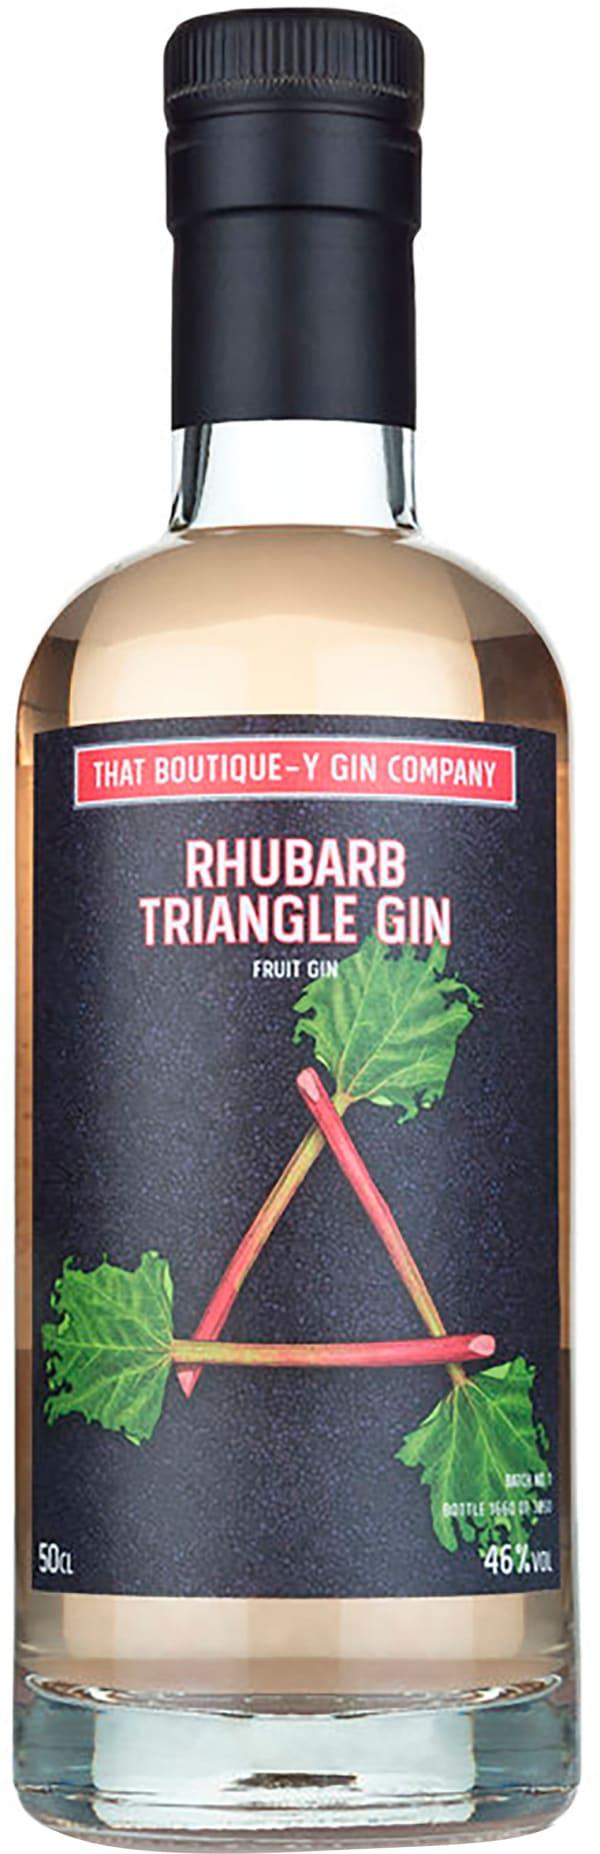 That Boutique-y Gin Company Rhubarb Triangle Gin